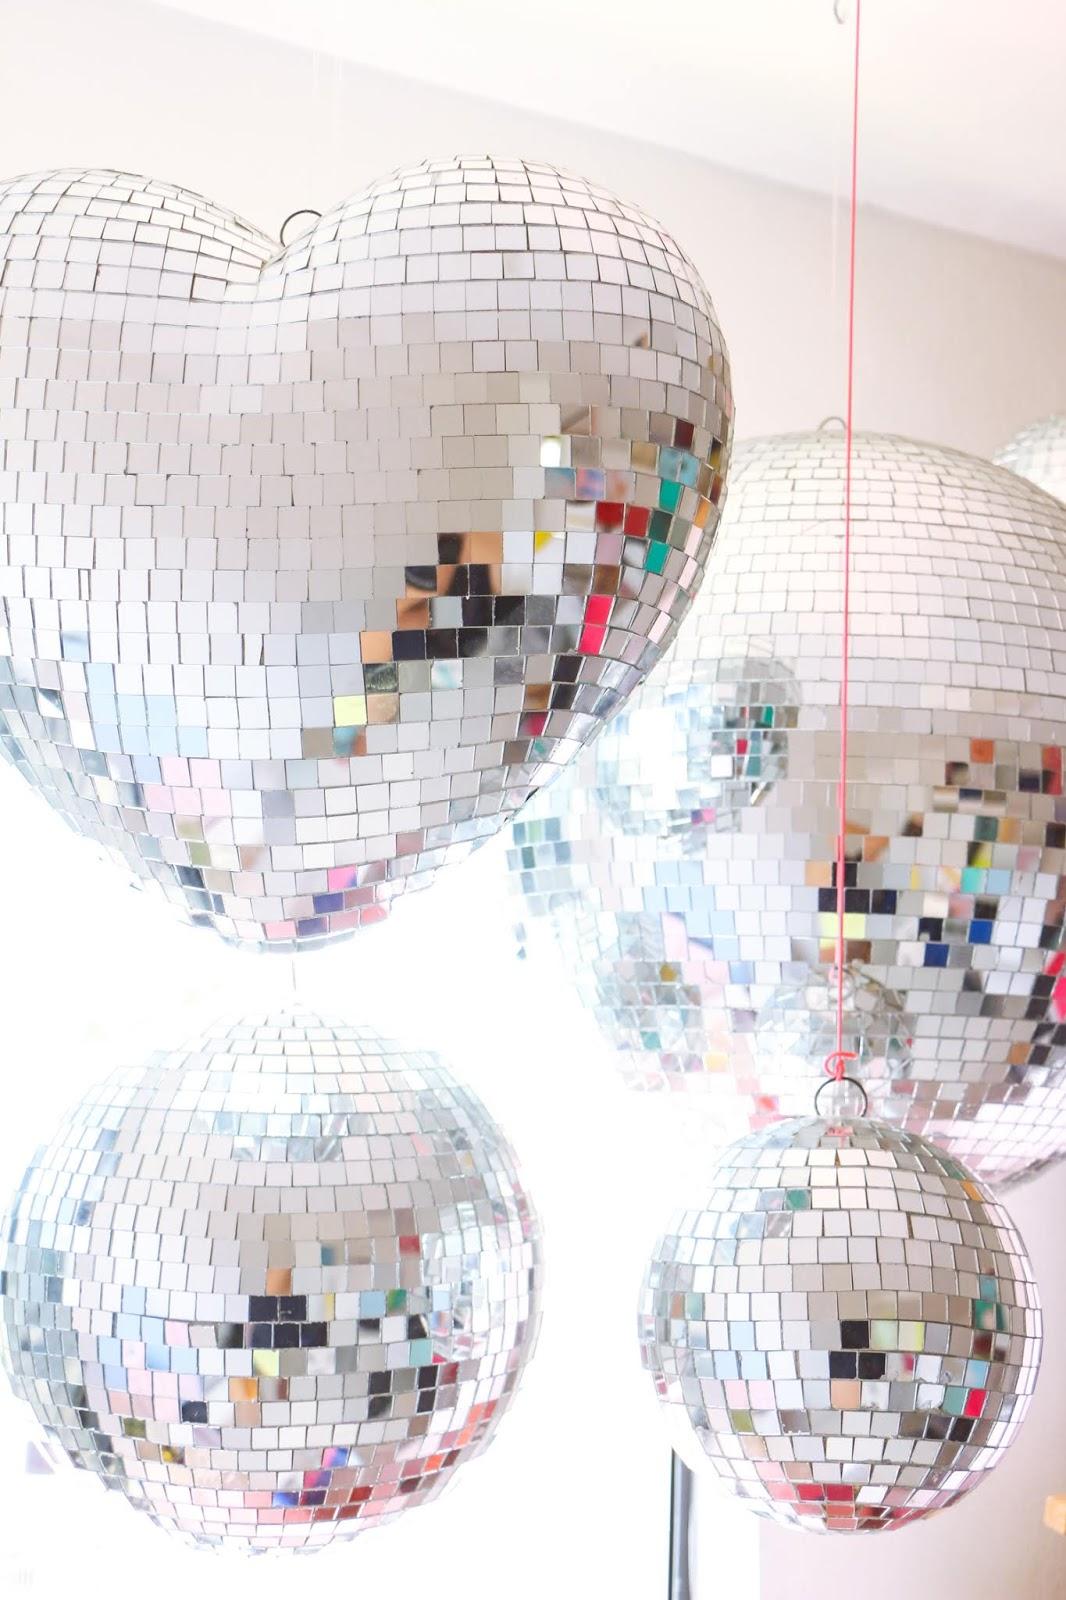 disco ball globo espelhado decoracao de casa mercado livre